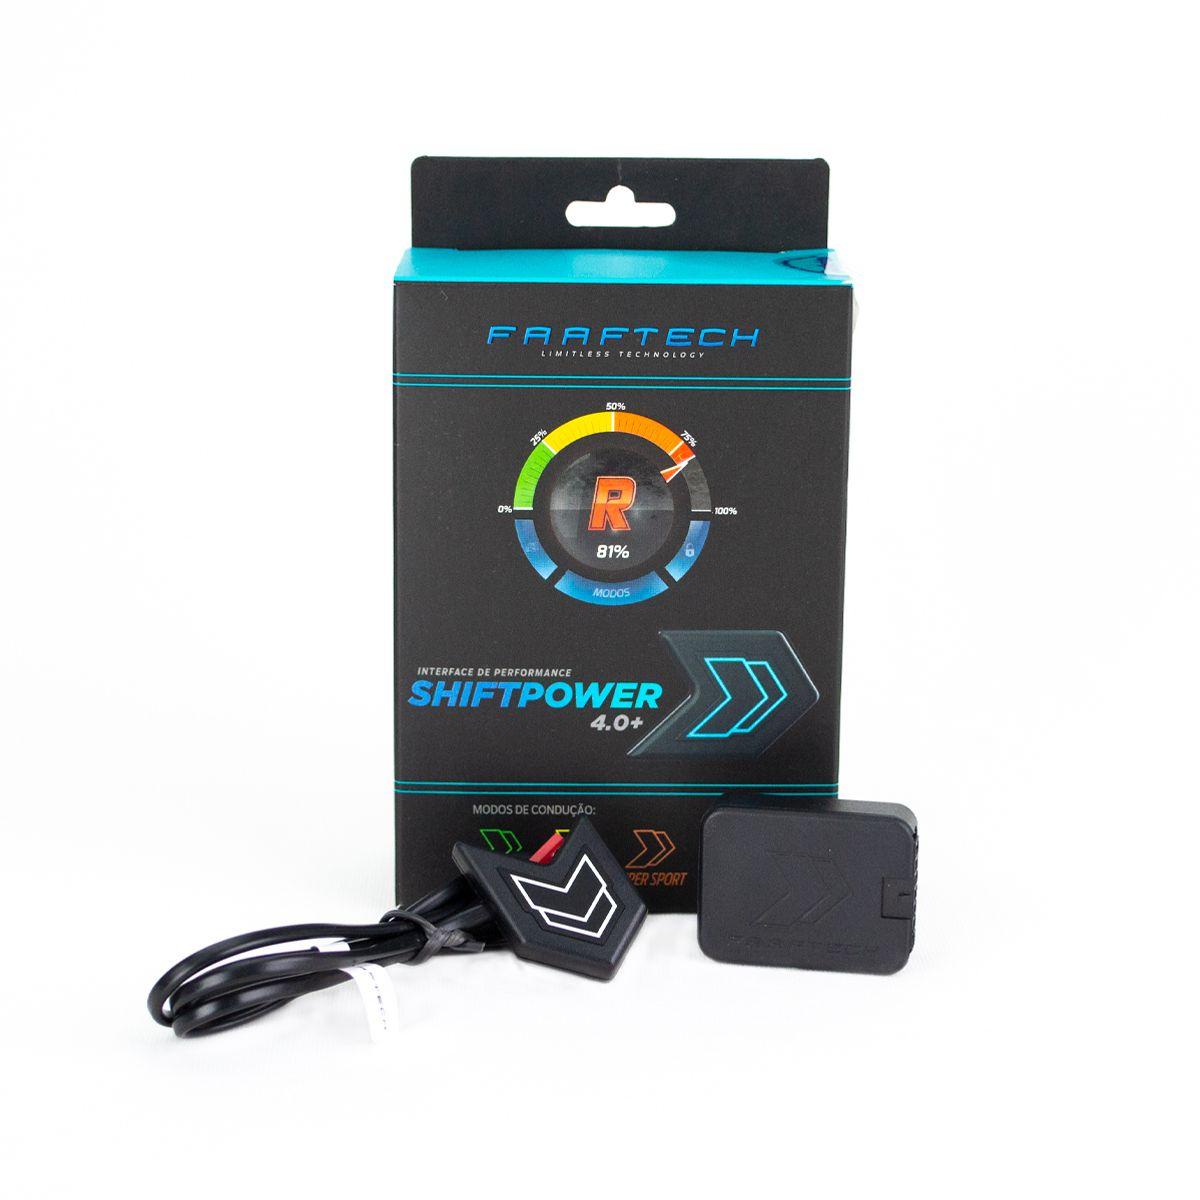 Chip de Pedal Shiftpower Para Citroen C4